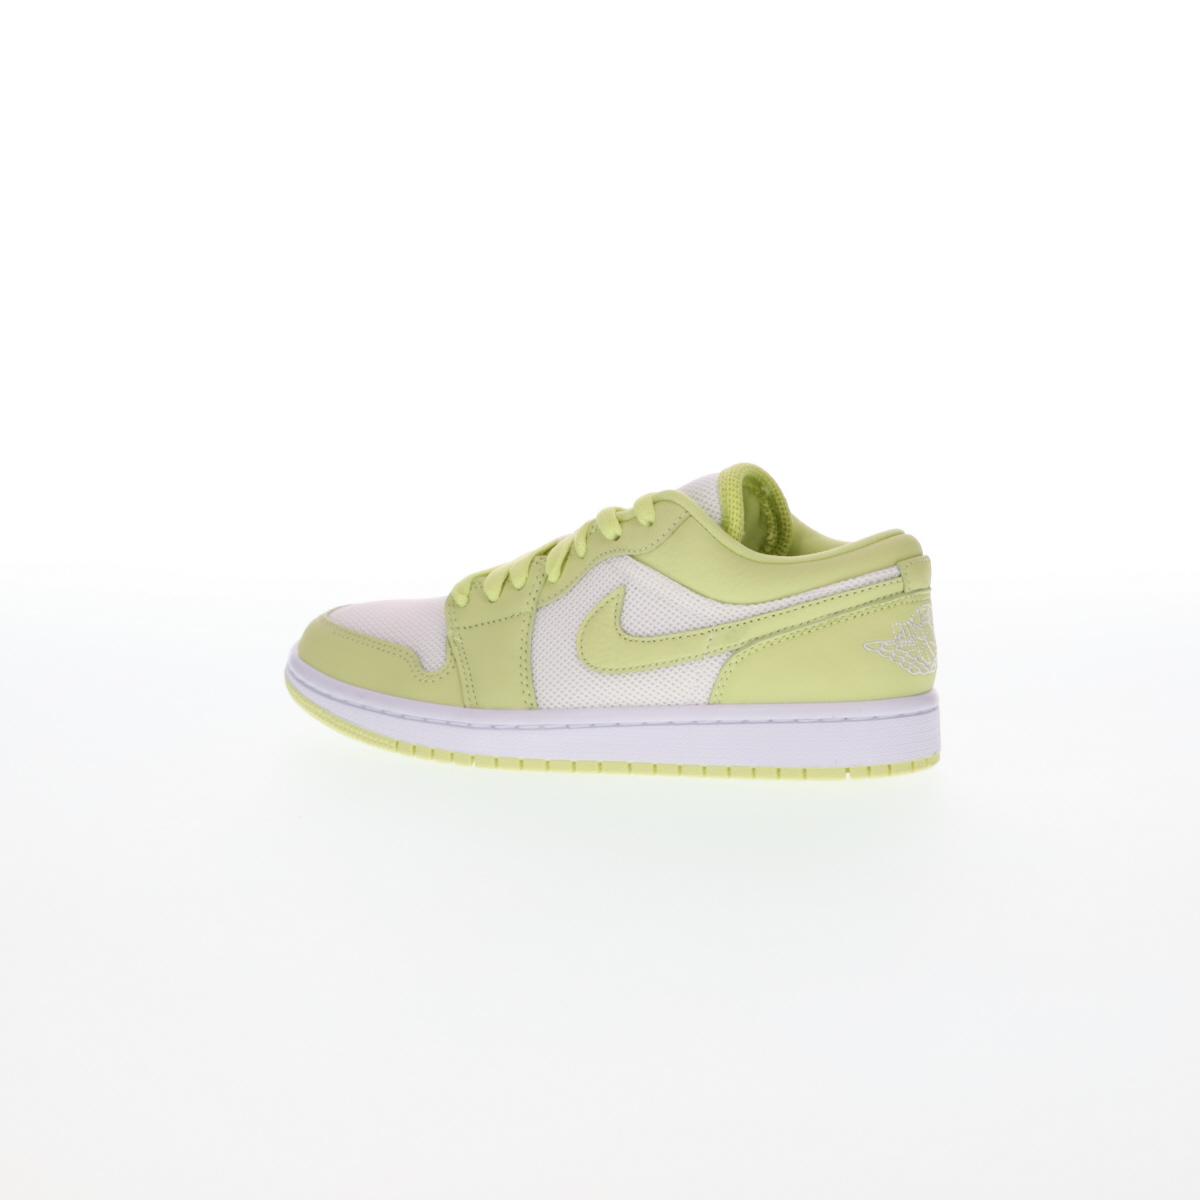 nike mariah flyknit beige shoes clearance